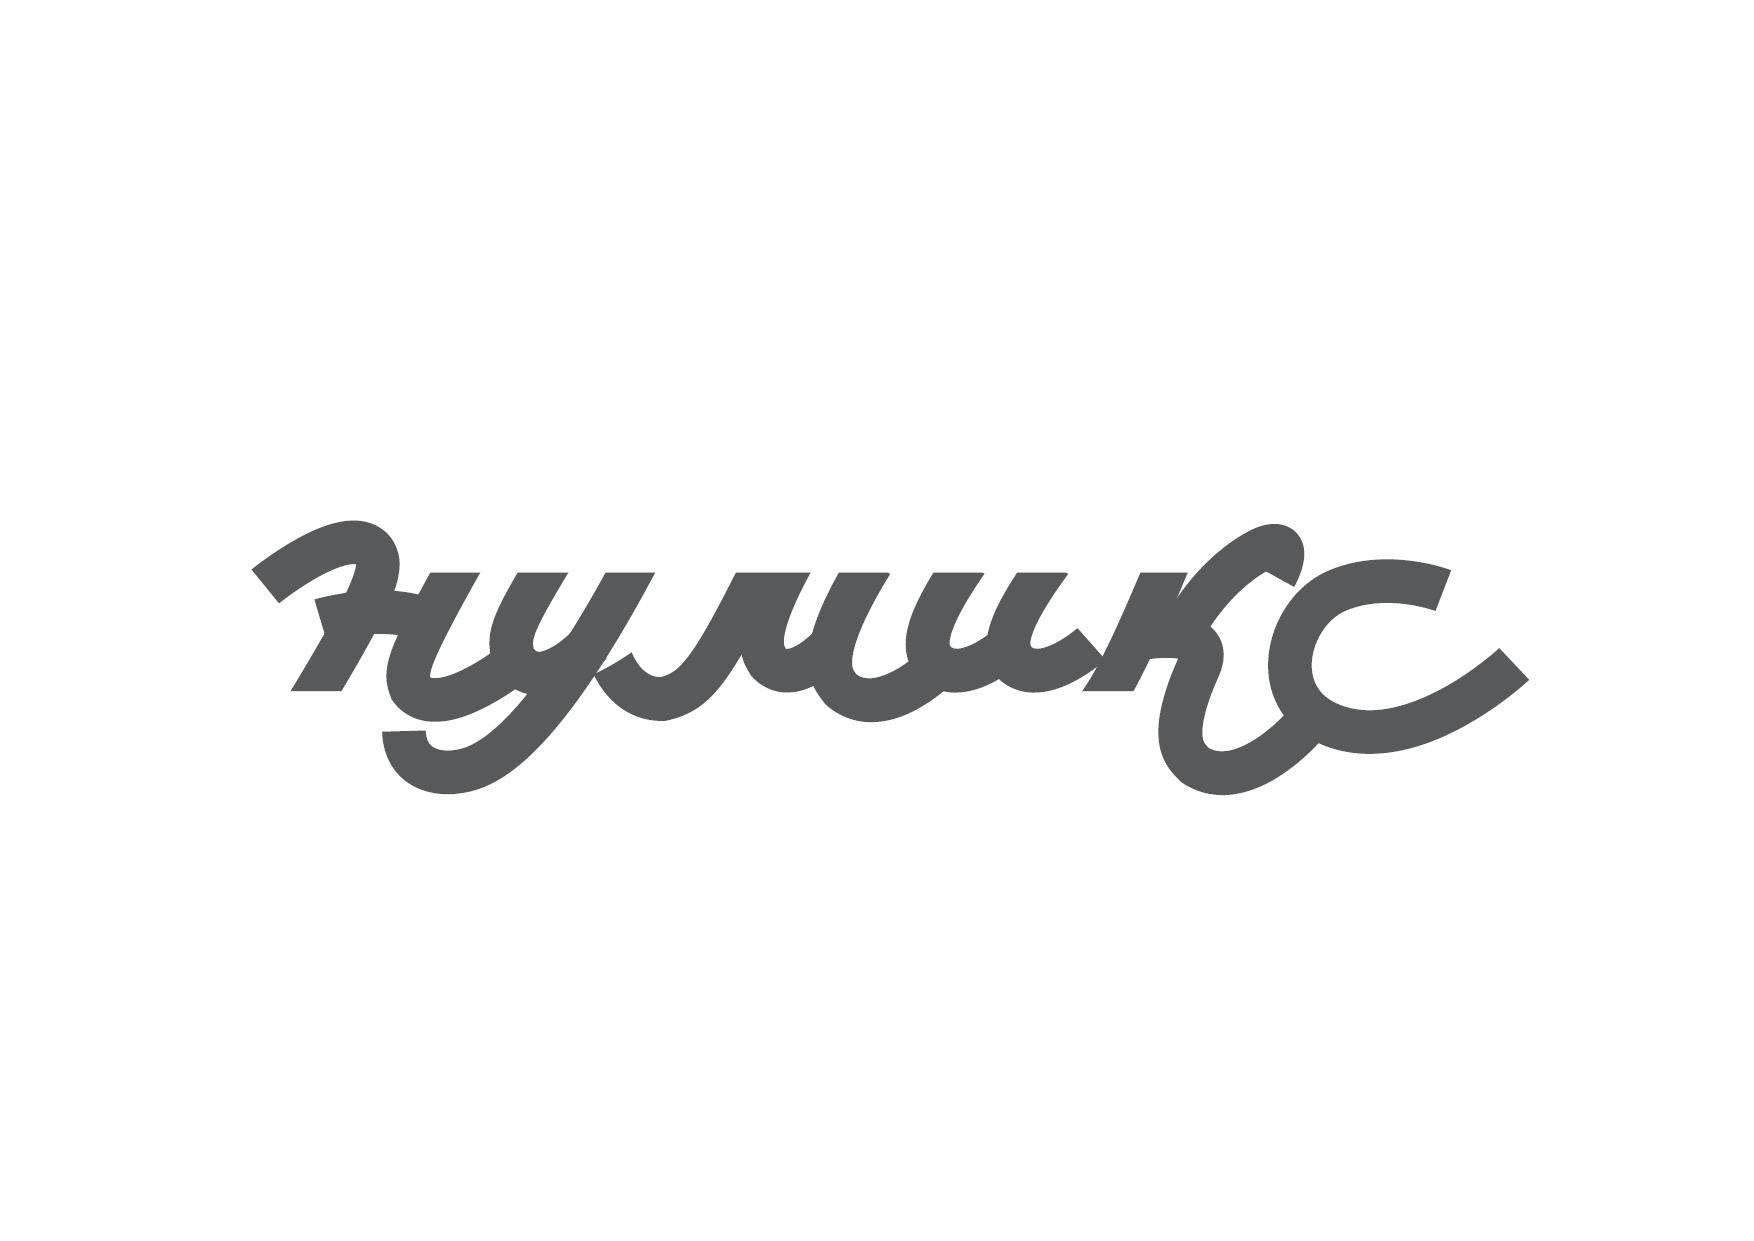 Логотип для интернет-магазина фото f_6255ec64466d1d69.jpg